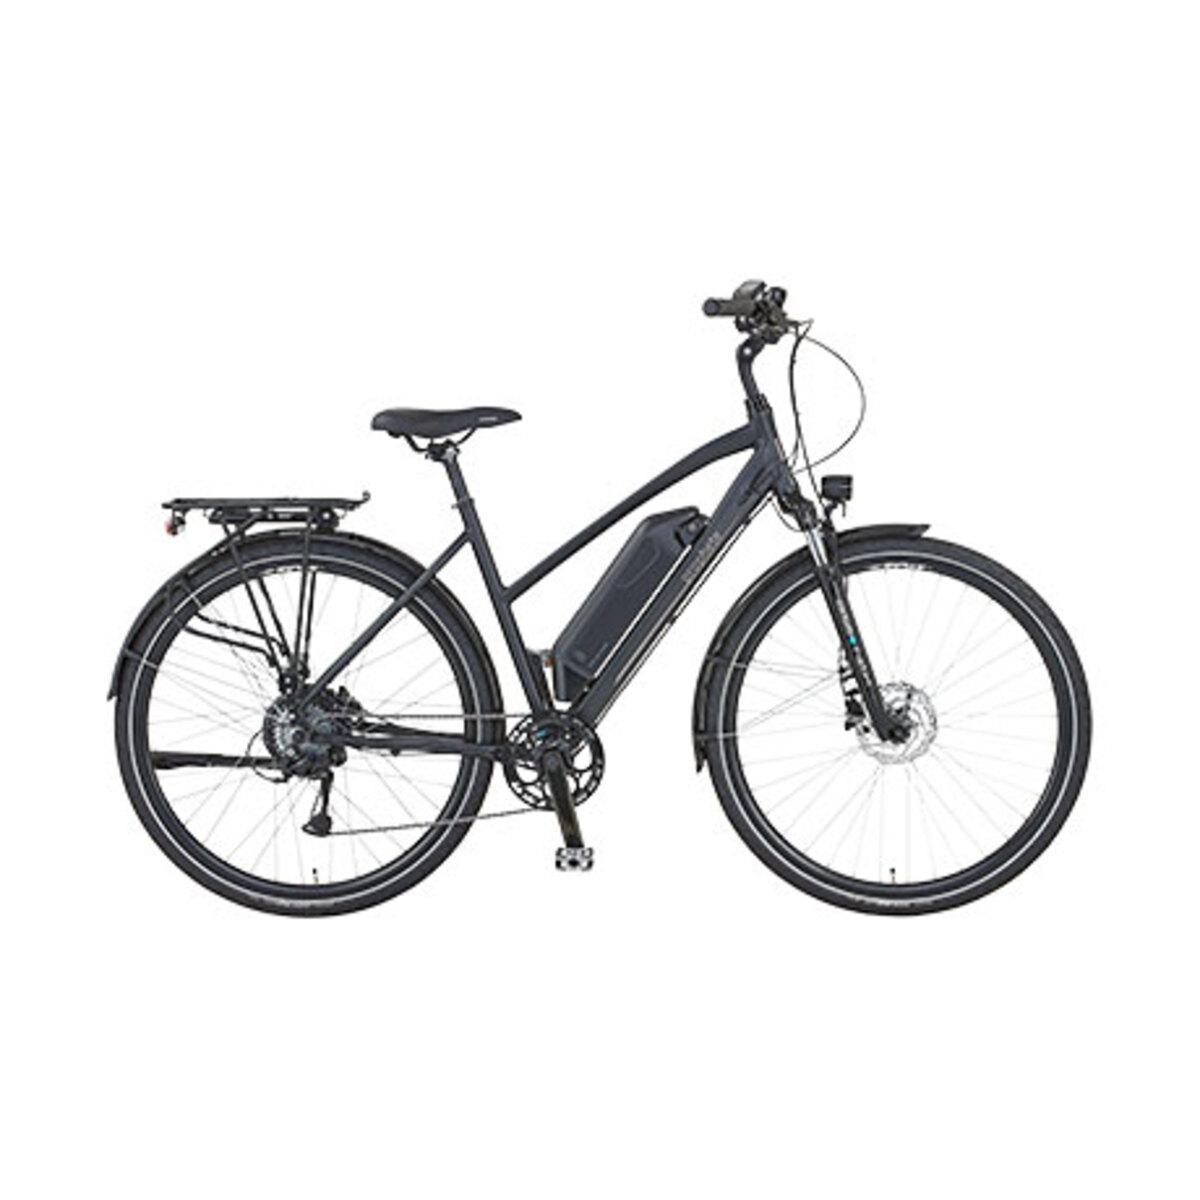 Bild 2 von Trekking-E-Bike Damen1